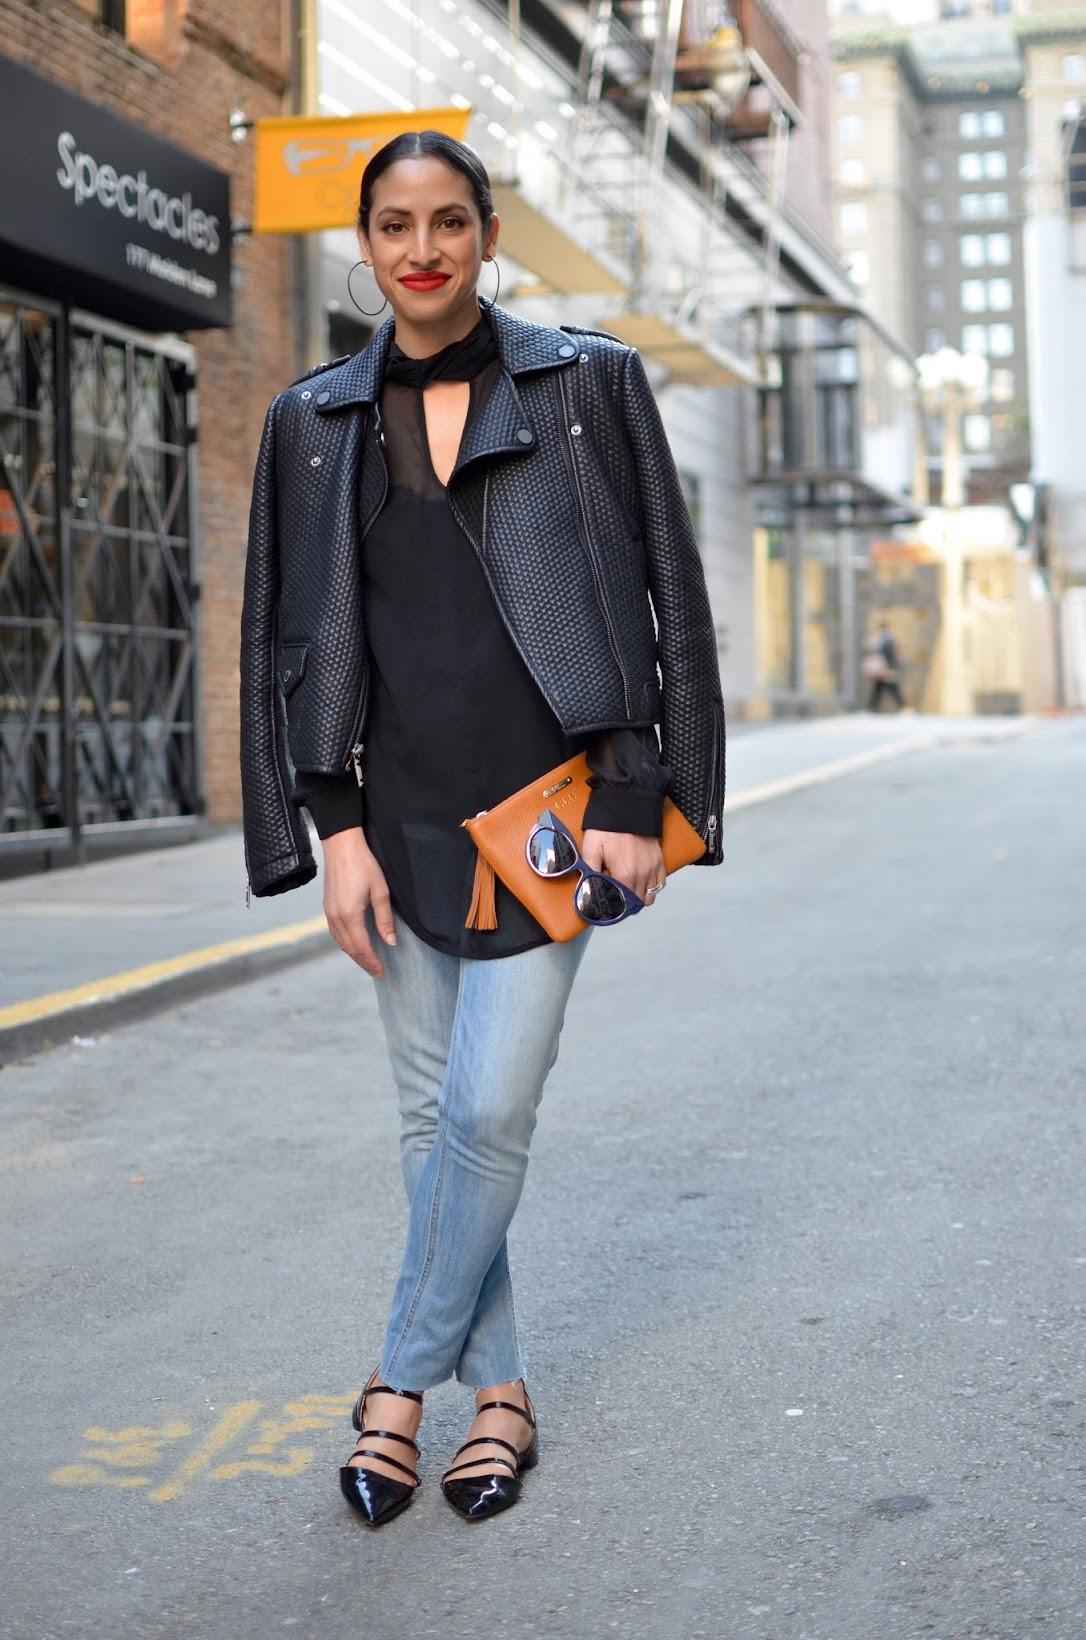 all black, OOTD,Gigi New York handbag, J. Crew denim, BCBG moto leather jacket, Stila Beso lipstick, SF streetstyle, streetstyle, Zara strappy sandals